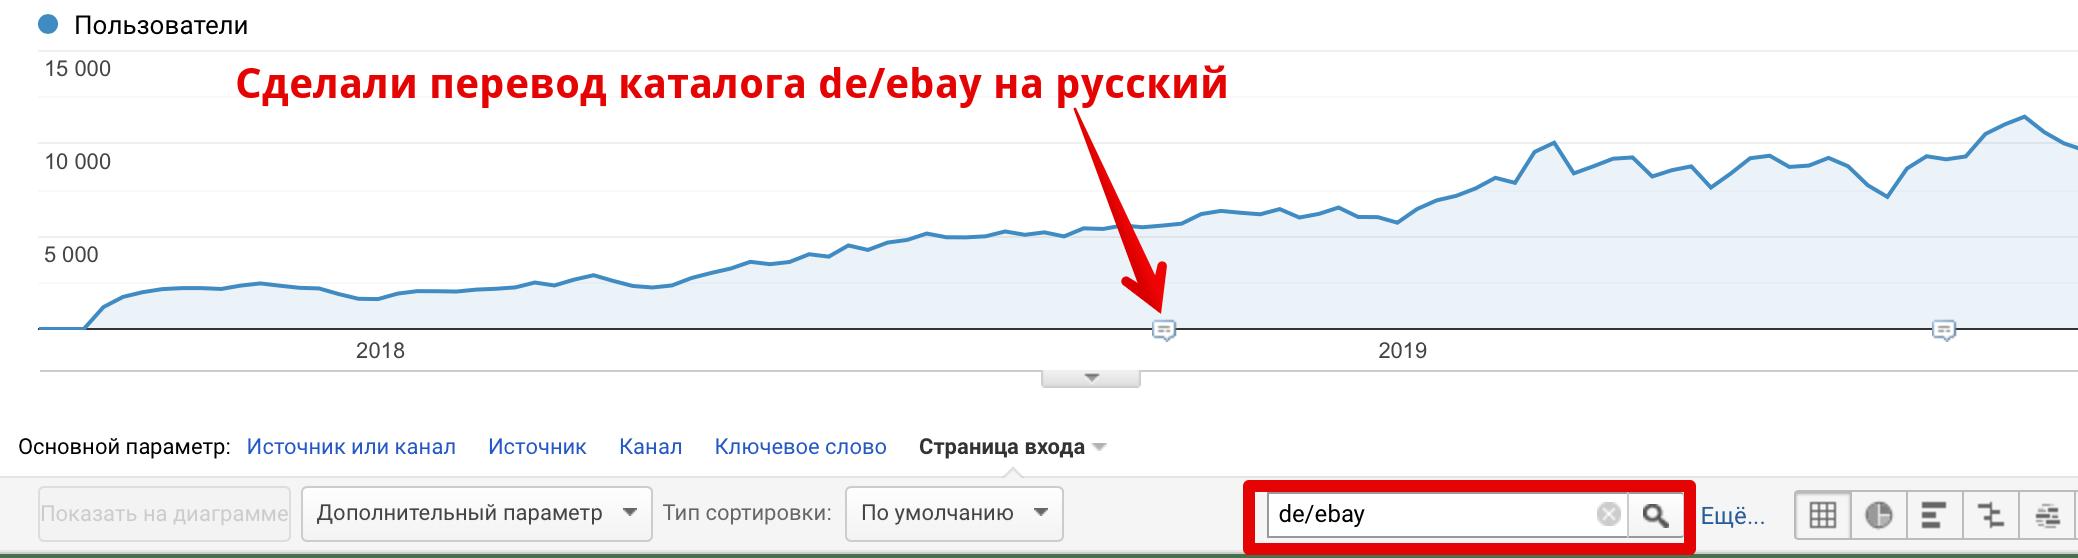 Динамика трафика после переводов каталога сайта